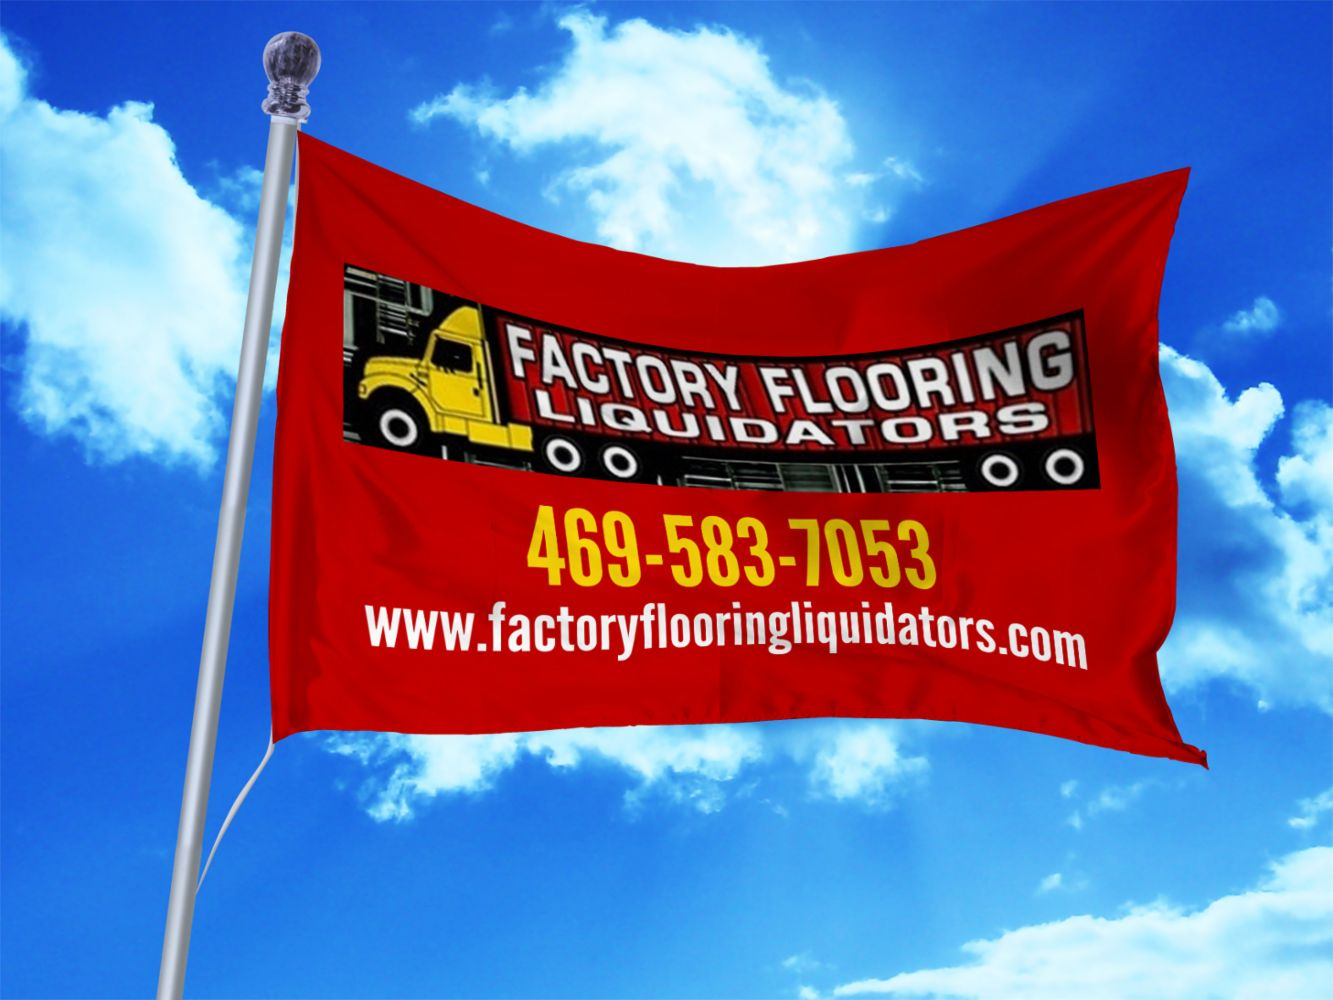 Factory Flooring Liquidators